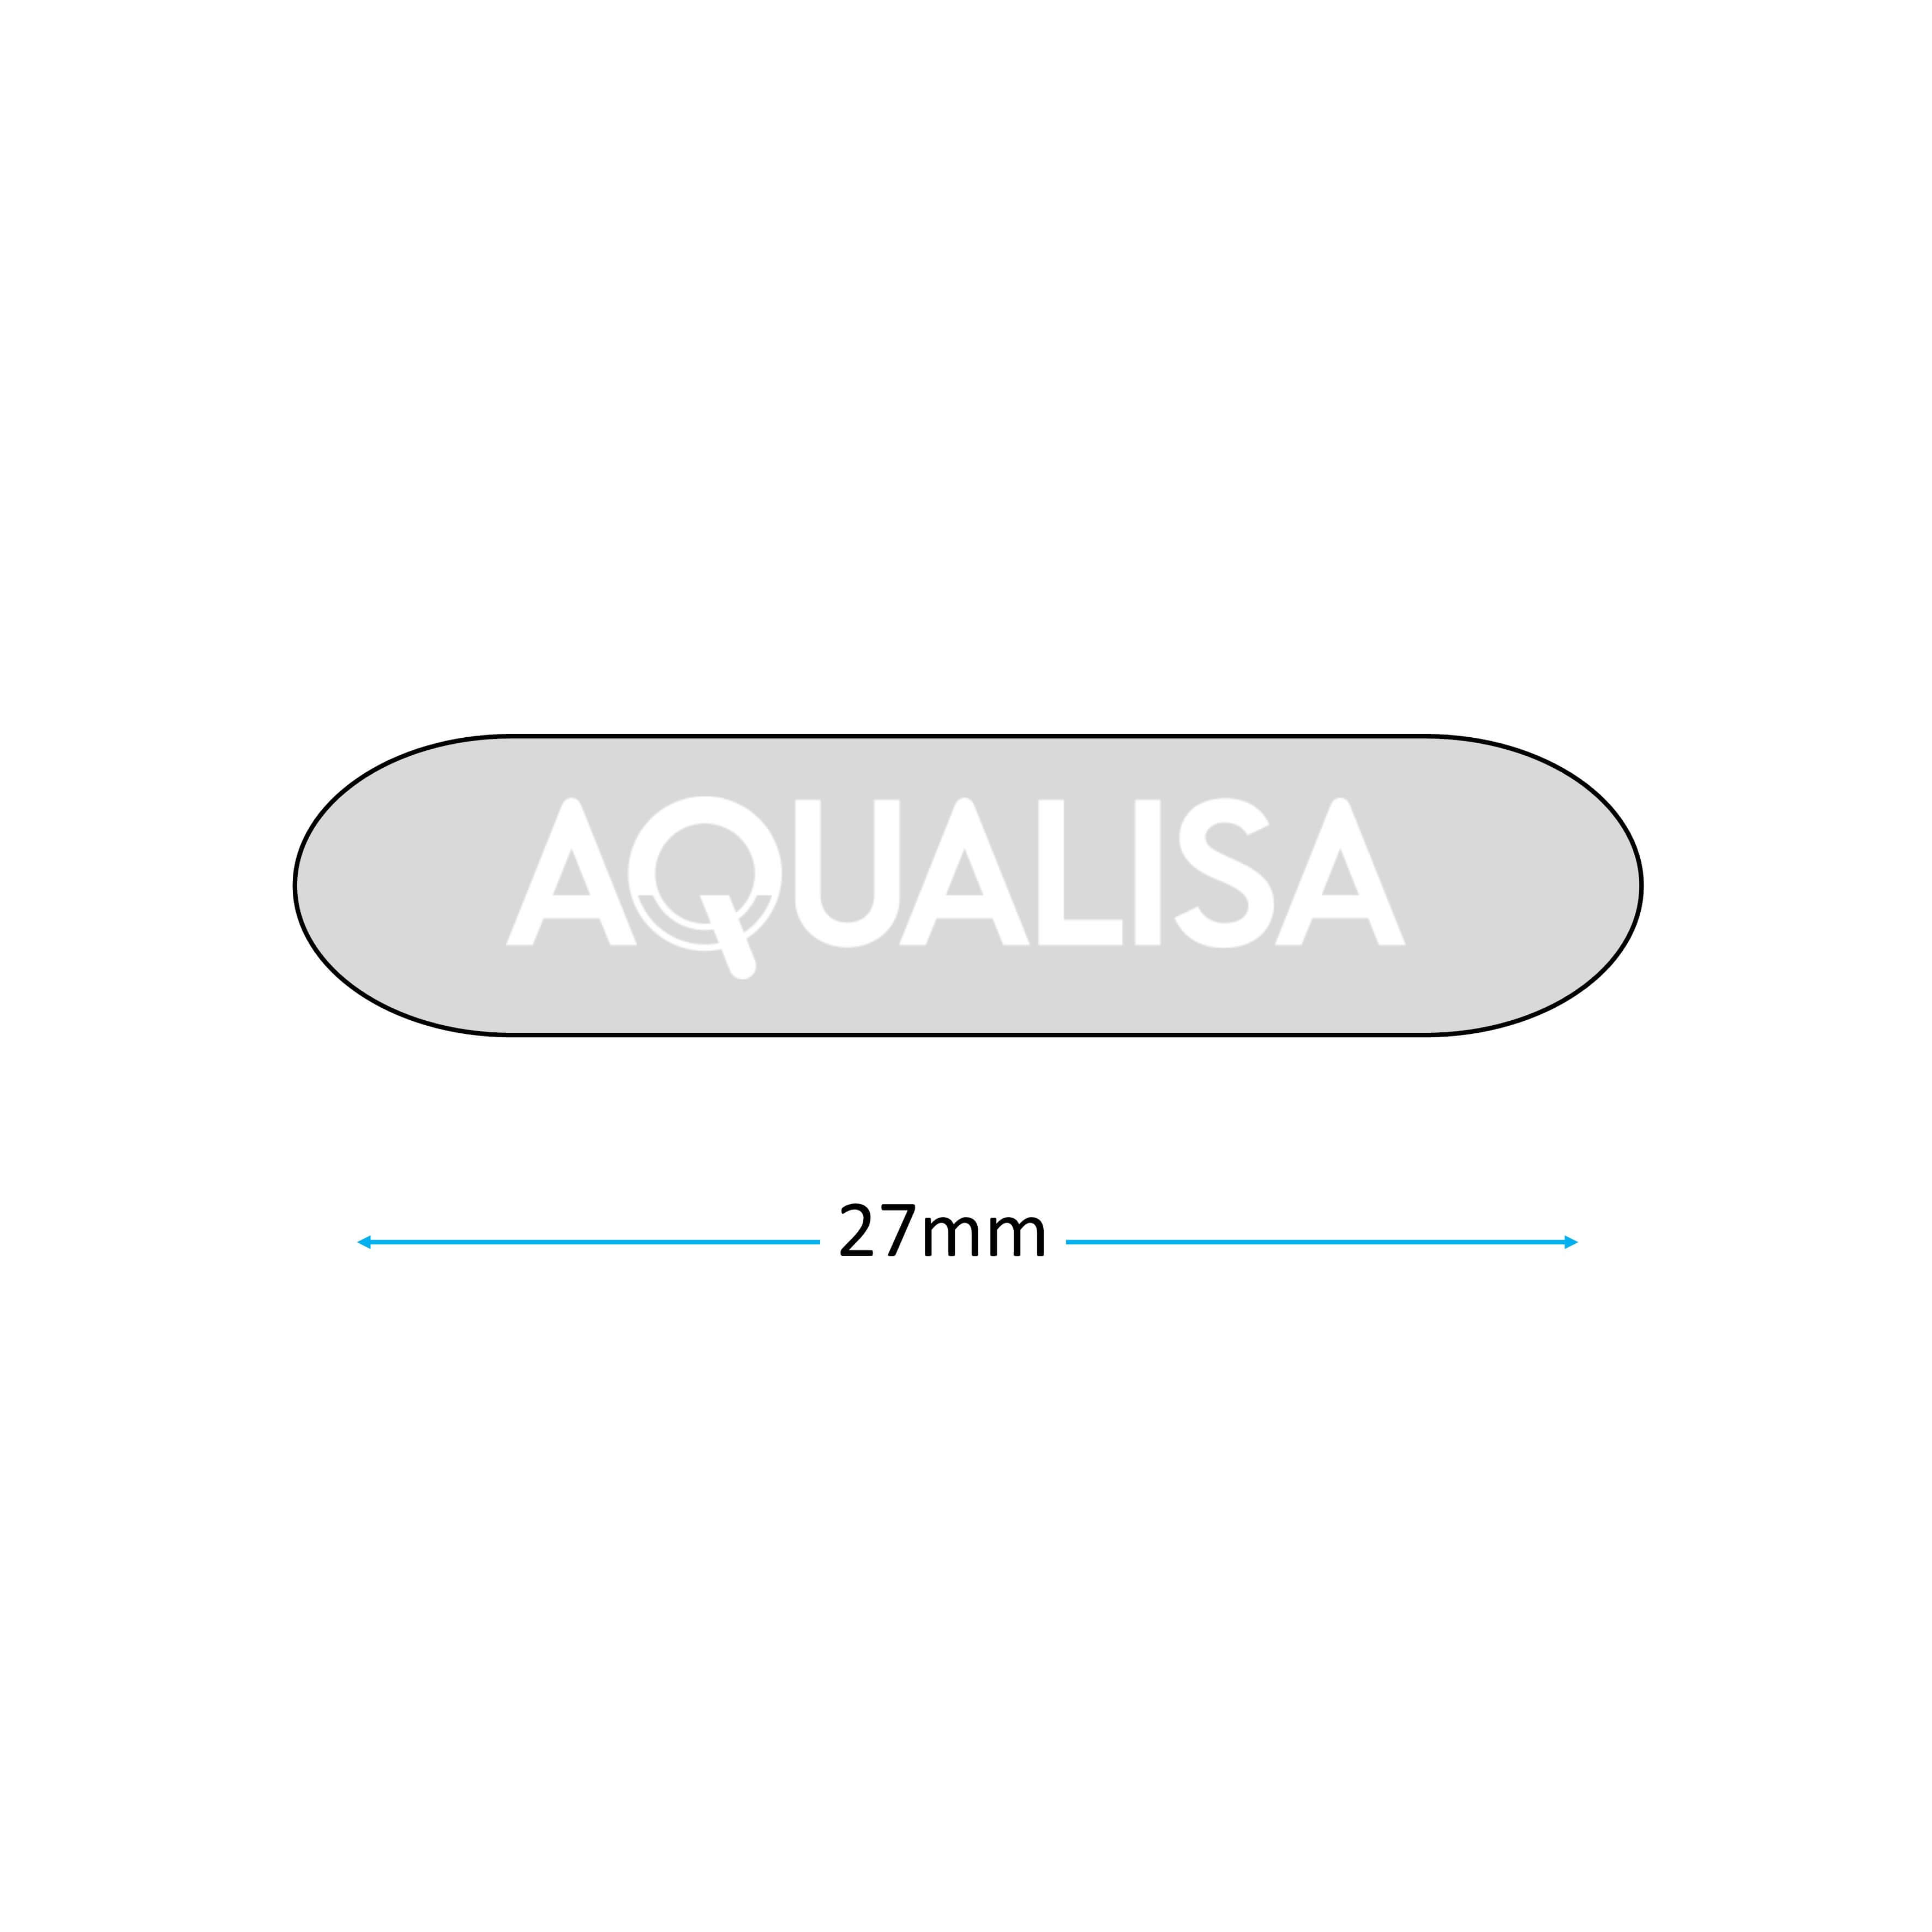 Aqualisa Aquarian Badge 213036